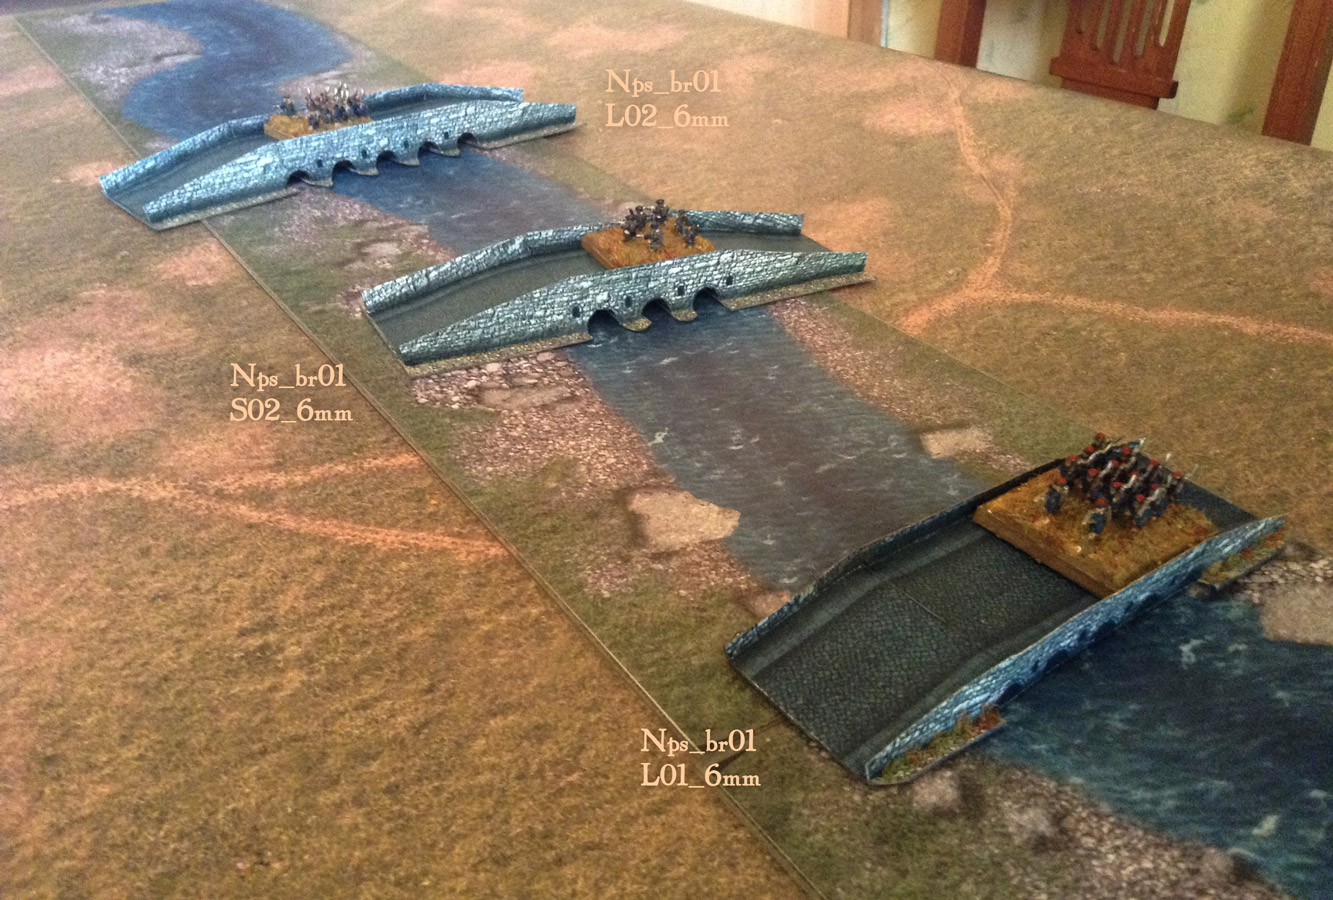 Stone Bridges set 6mm (1/285), 10mm, 15mm - WargamePrint | Foldable Paper  Scenery | DriveThruRPG com